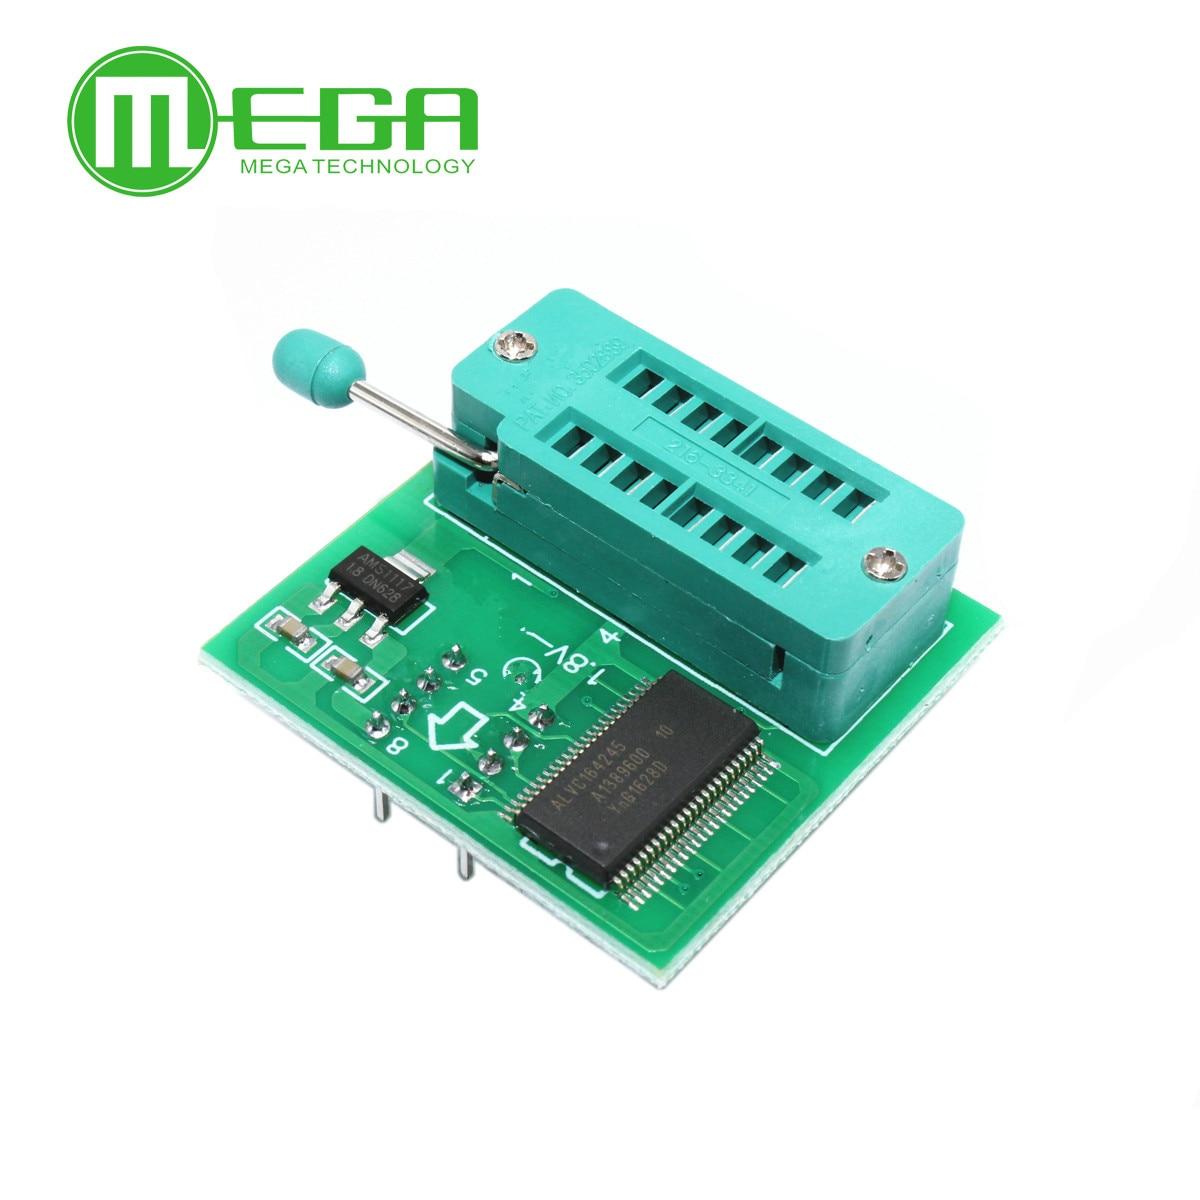 1.8V adapter for  motherboard 1.8V SPI Flash SOP8 DIP8 W25 MX25 use on programmers TL866CS TL866A EZP2010 EZP2013 CH341